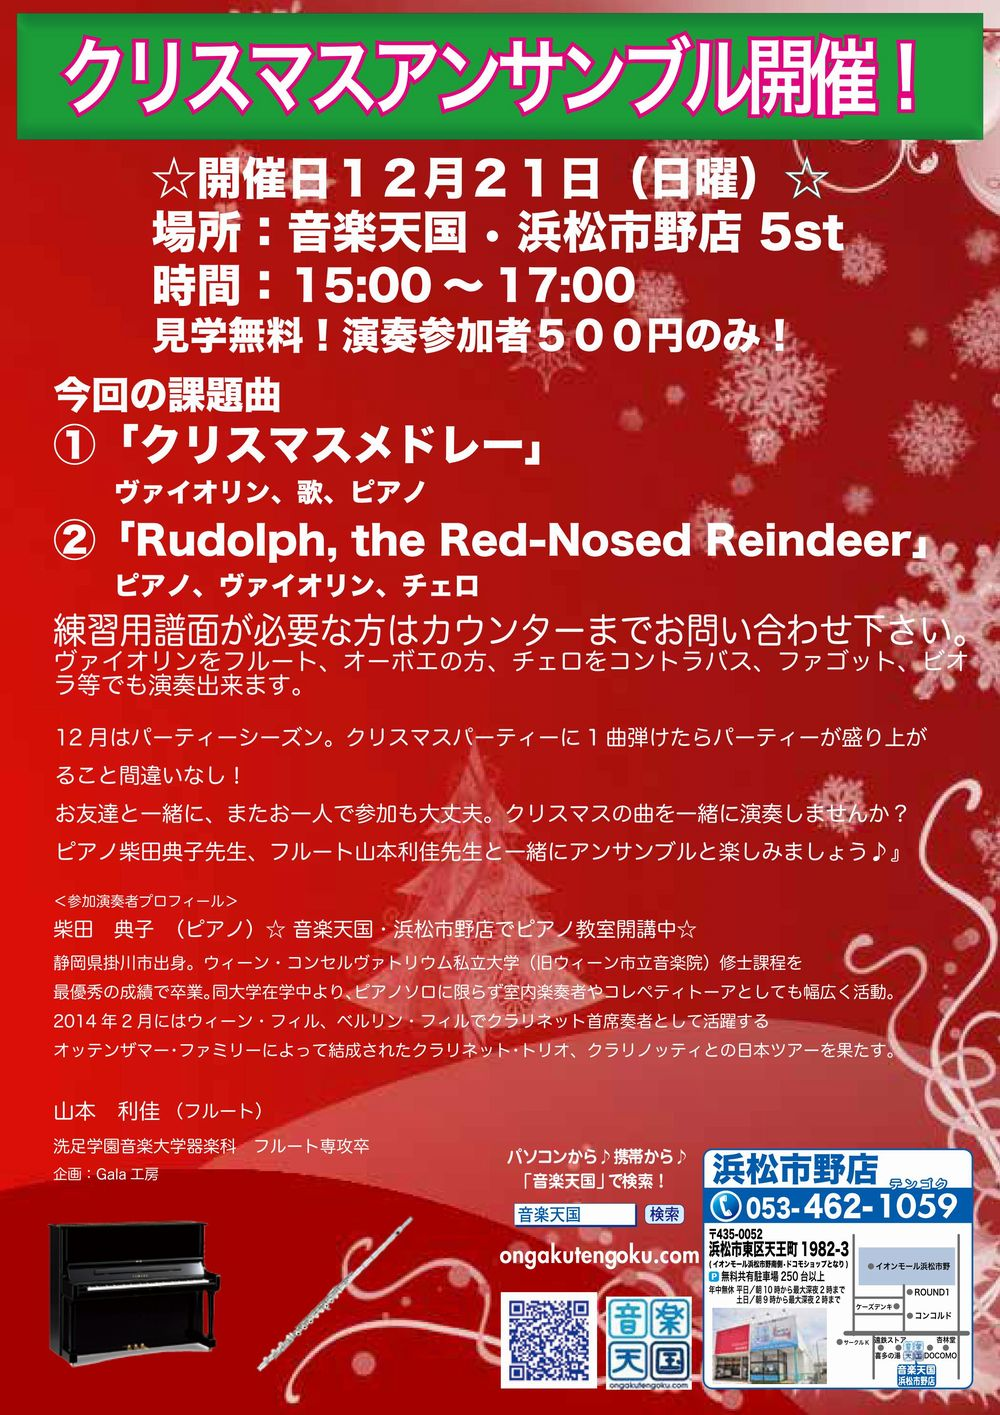 【X'mas・クラシックアンサンブル】音楽天国・浜松市野店12月21日(日)開催!